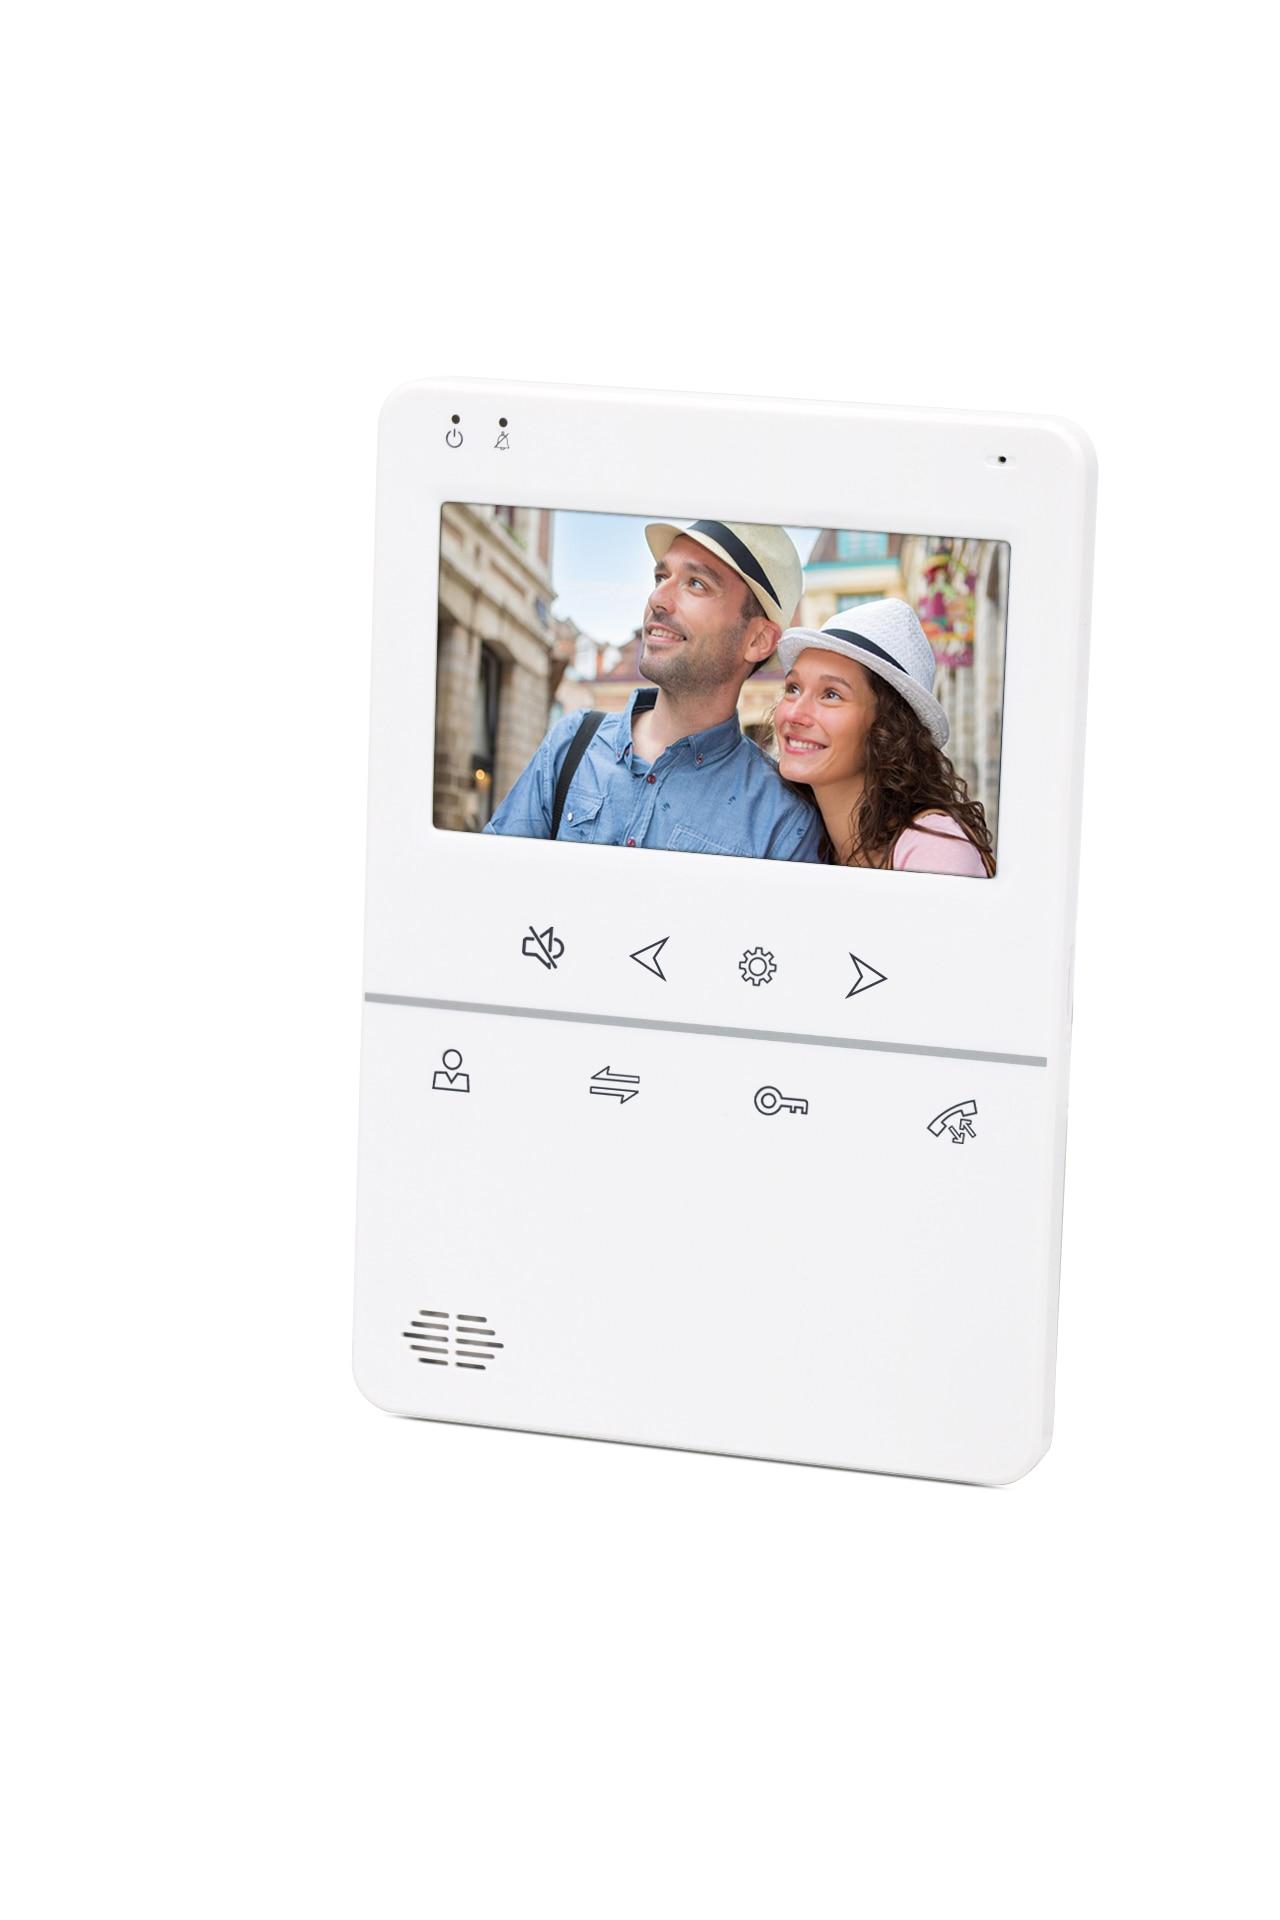 Joytimer Video Door Phone Intercom Camera 4.3-Inch Video intercom Record Unlock DoorBell Pinhole Camera Security Control System enlarge